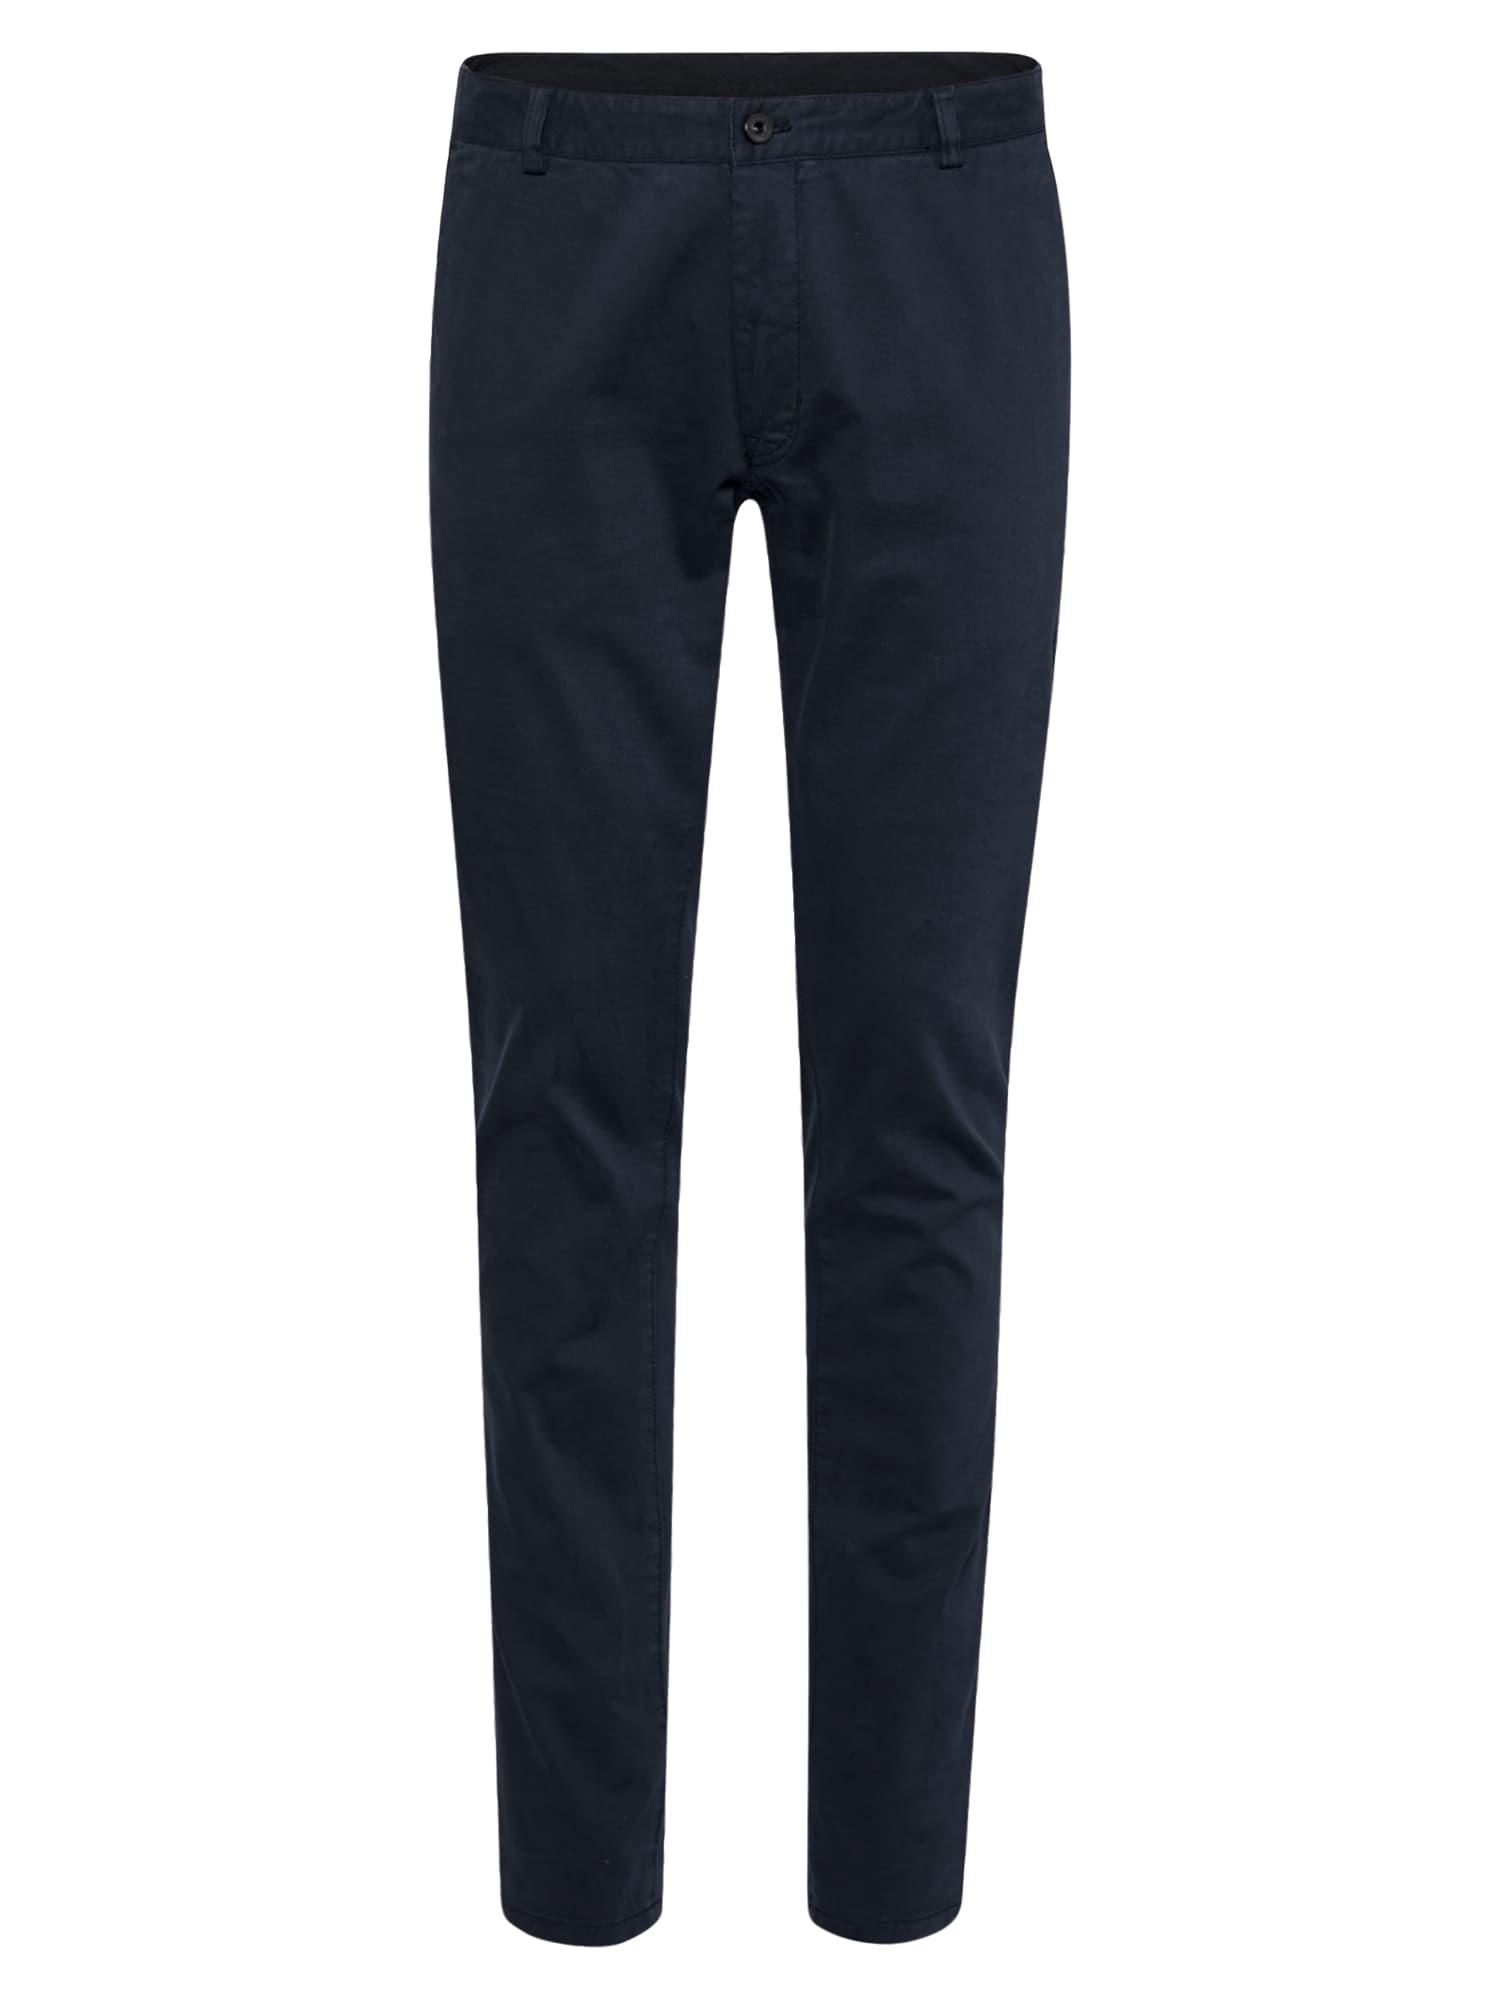 Tiger of Sweden Pantalon 'TRANSIT 4.'  - Bleu - Taille: 48 - male